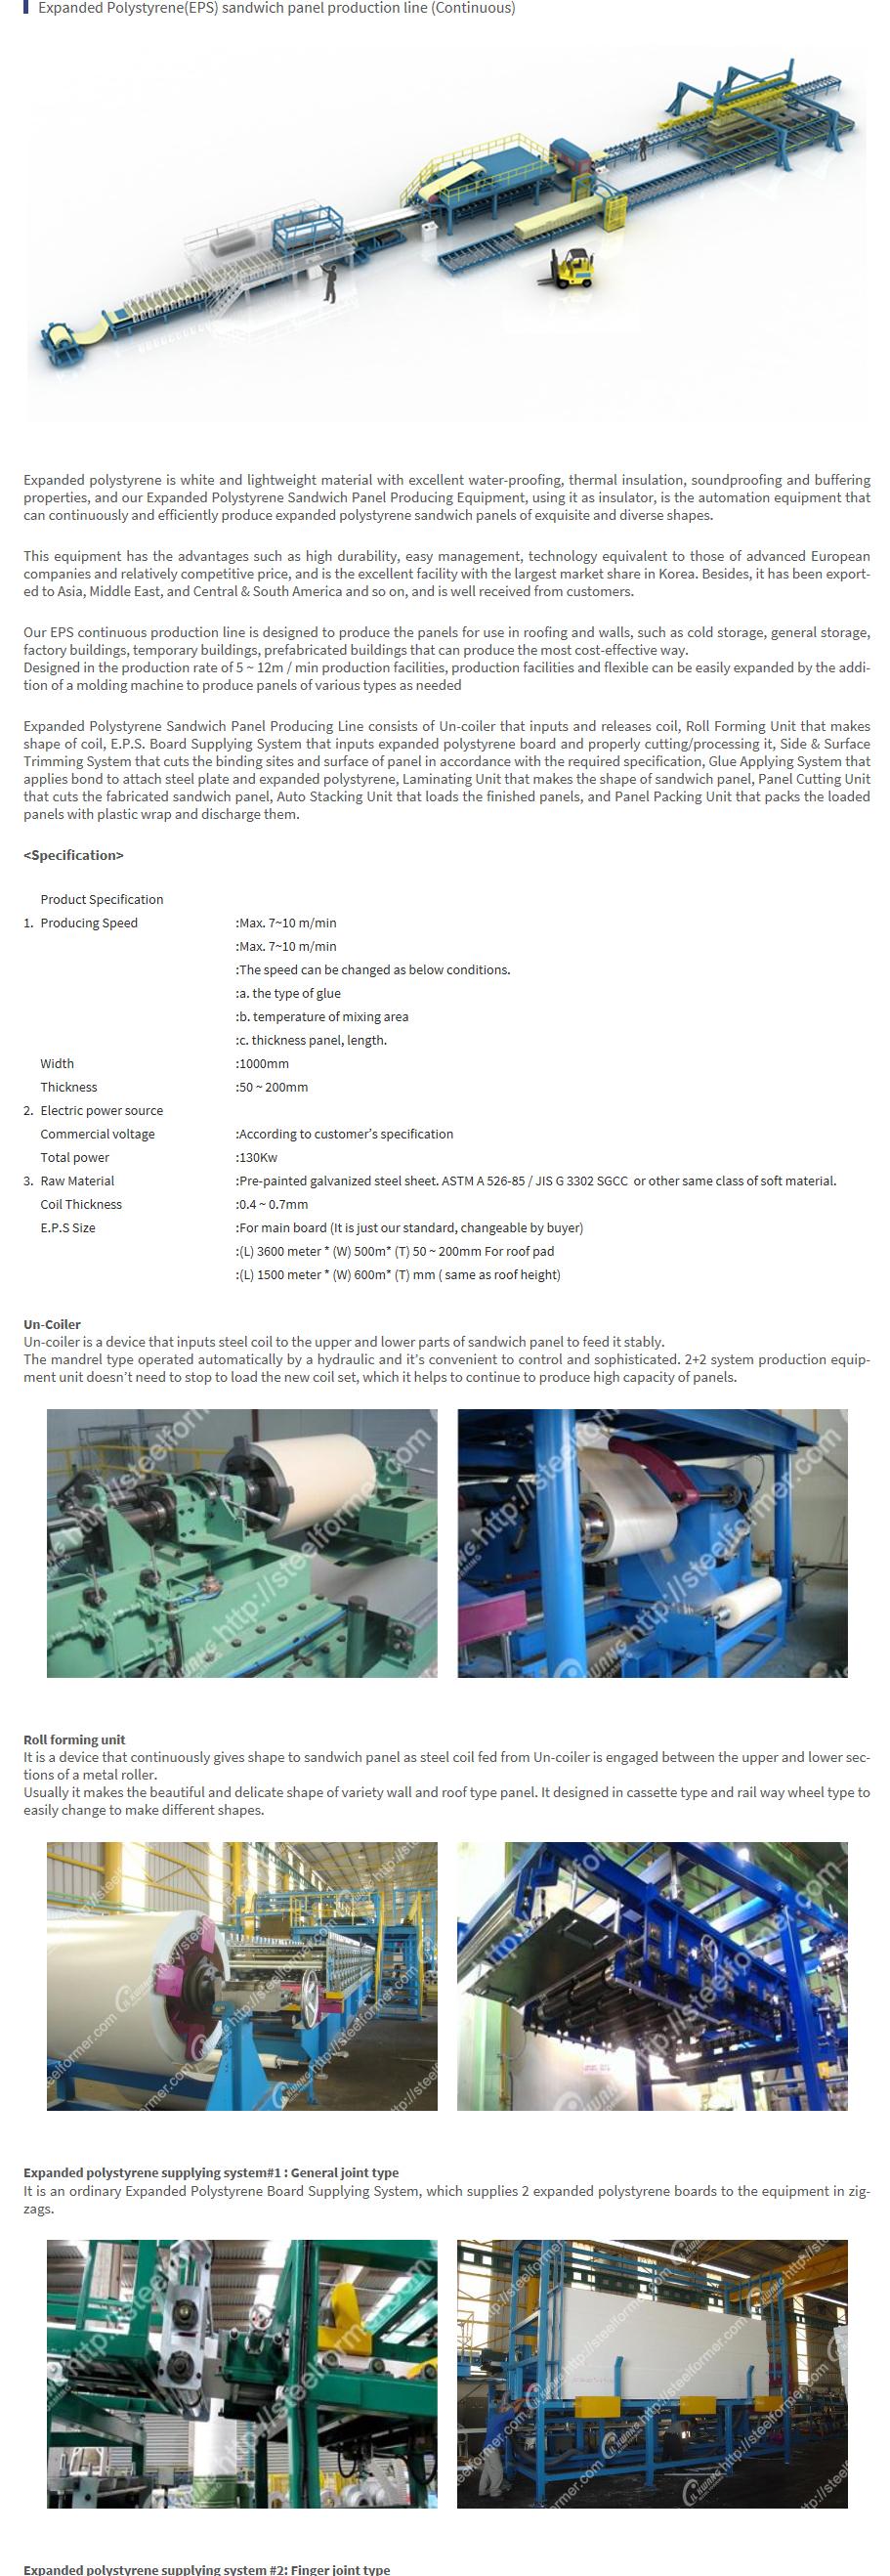 ILKWANG Metal Forming - EPS sandwich panel machine